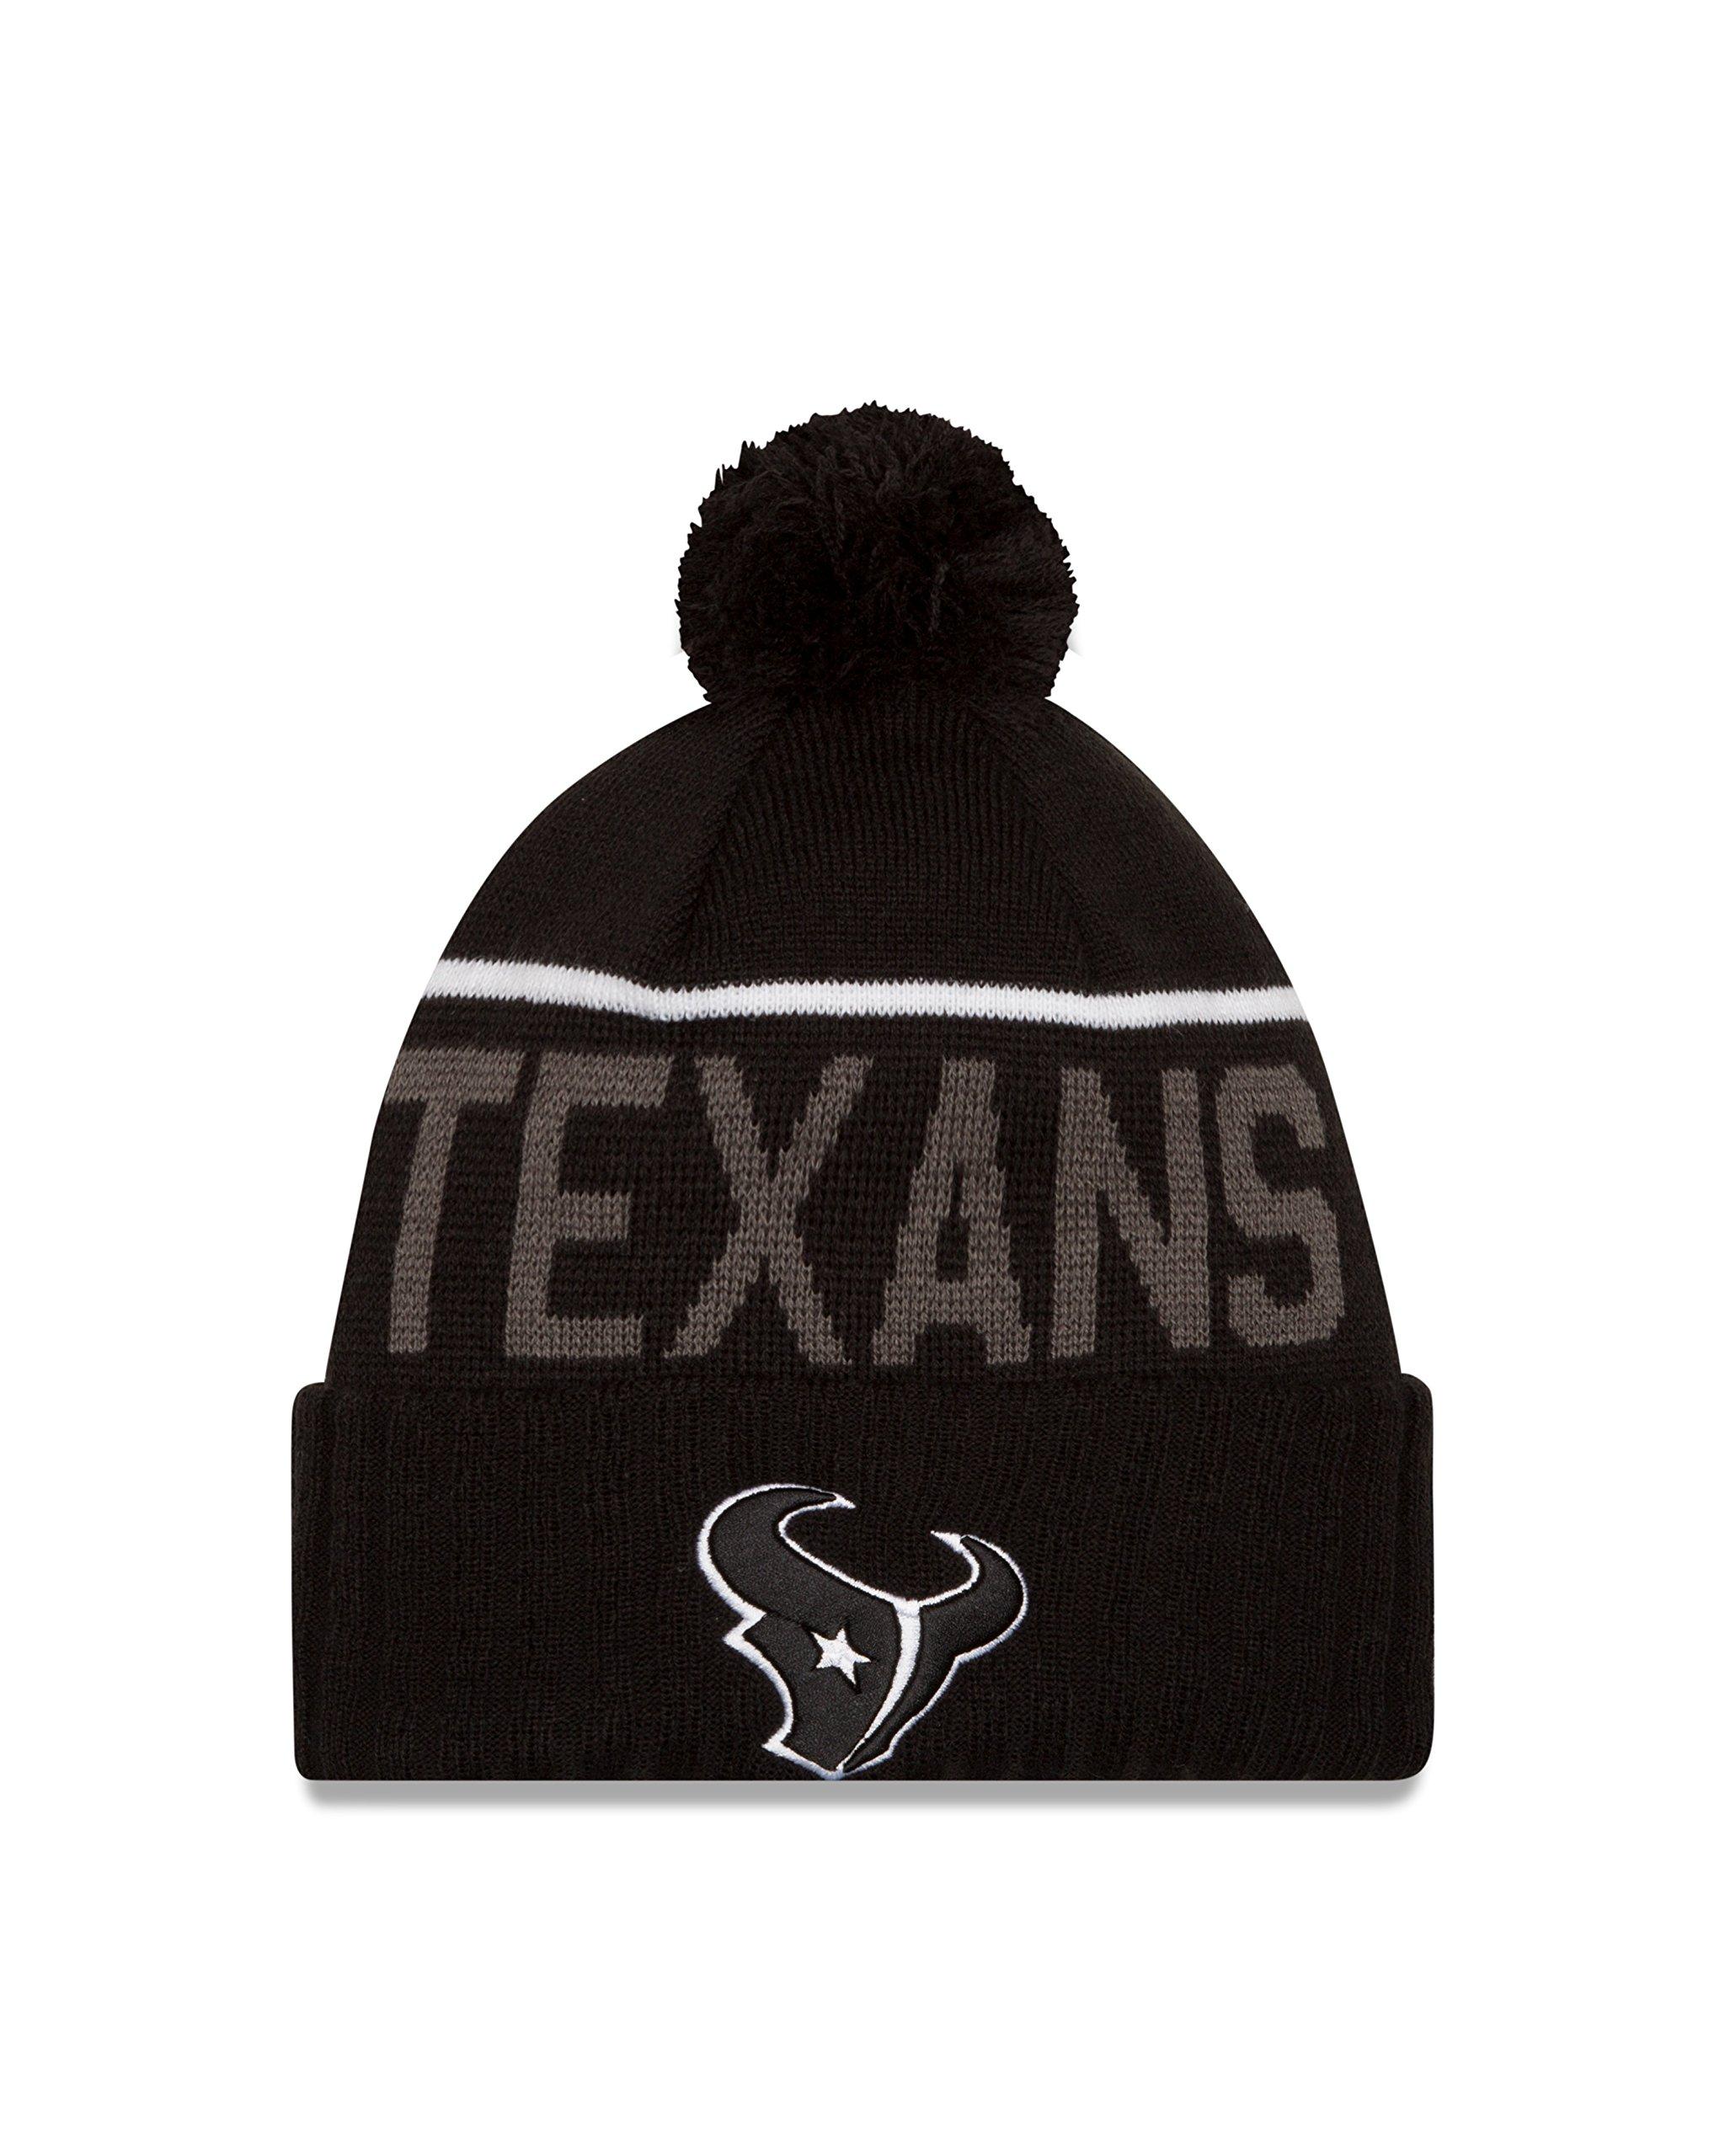 NFL Houston Texans 2015 Sport Knit, Black, One Size by New Era